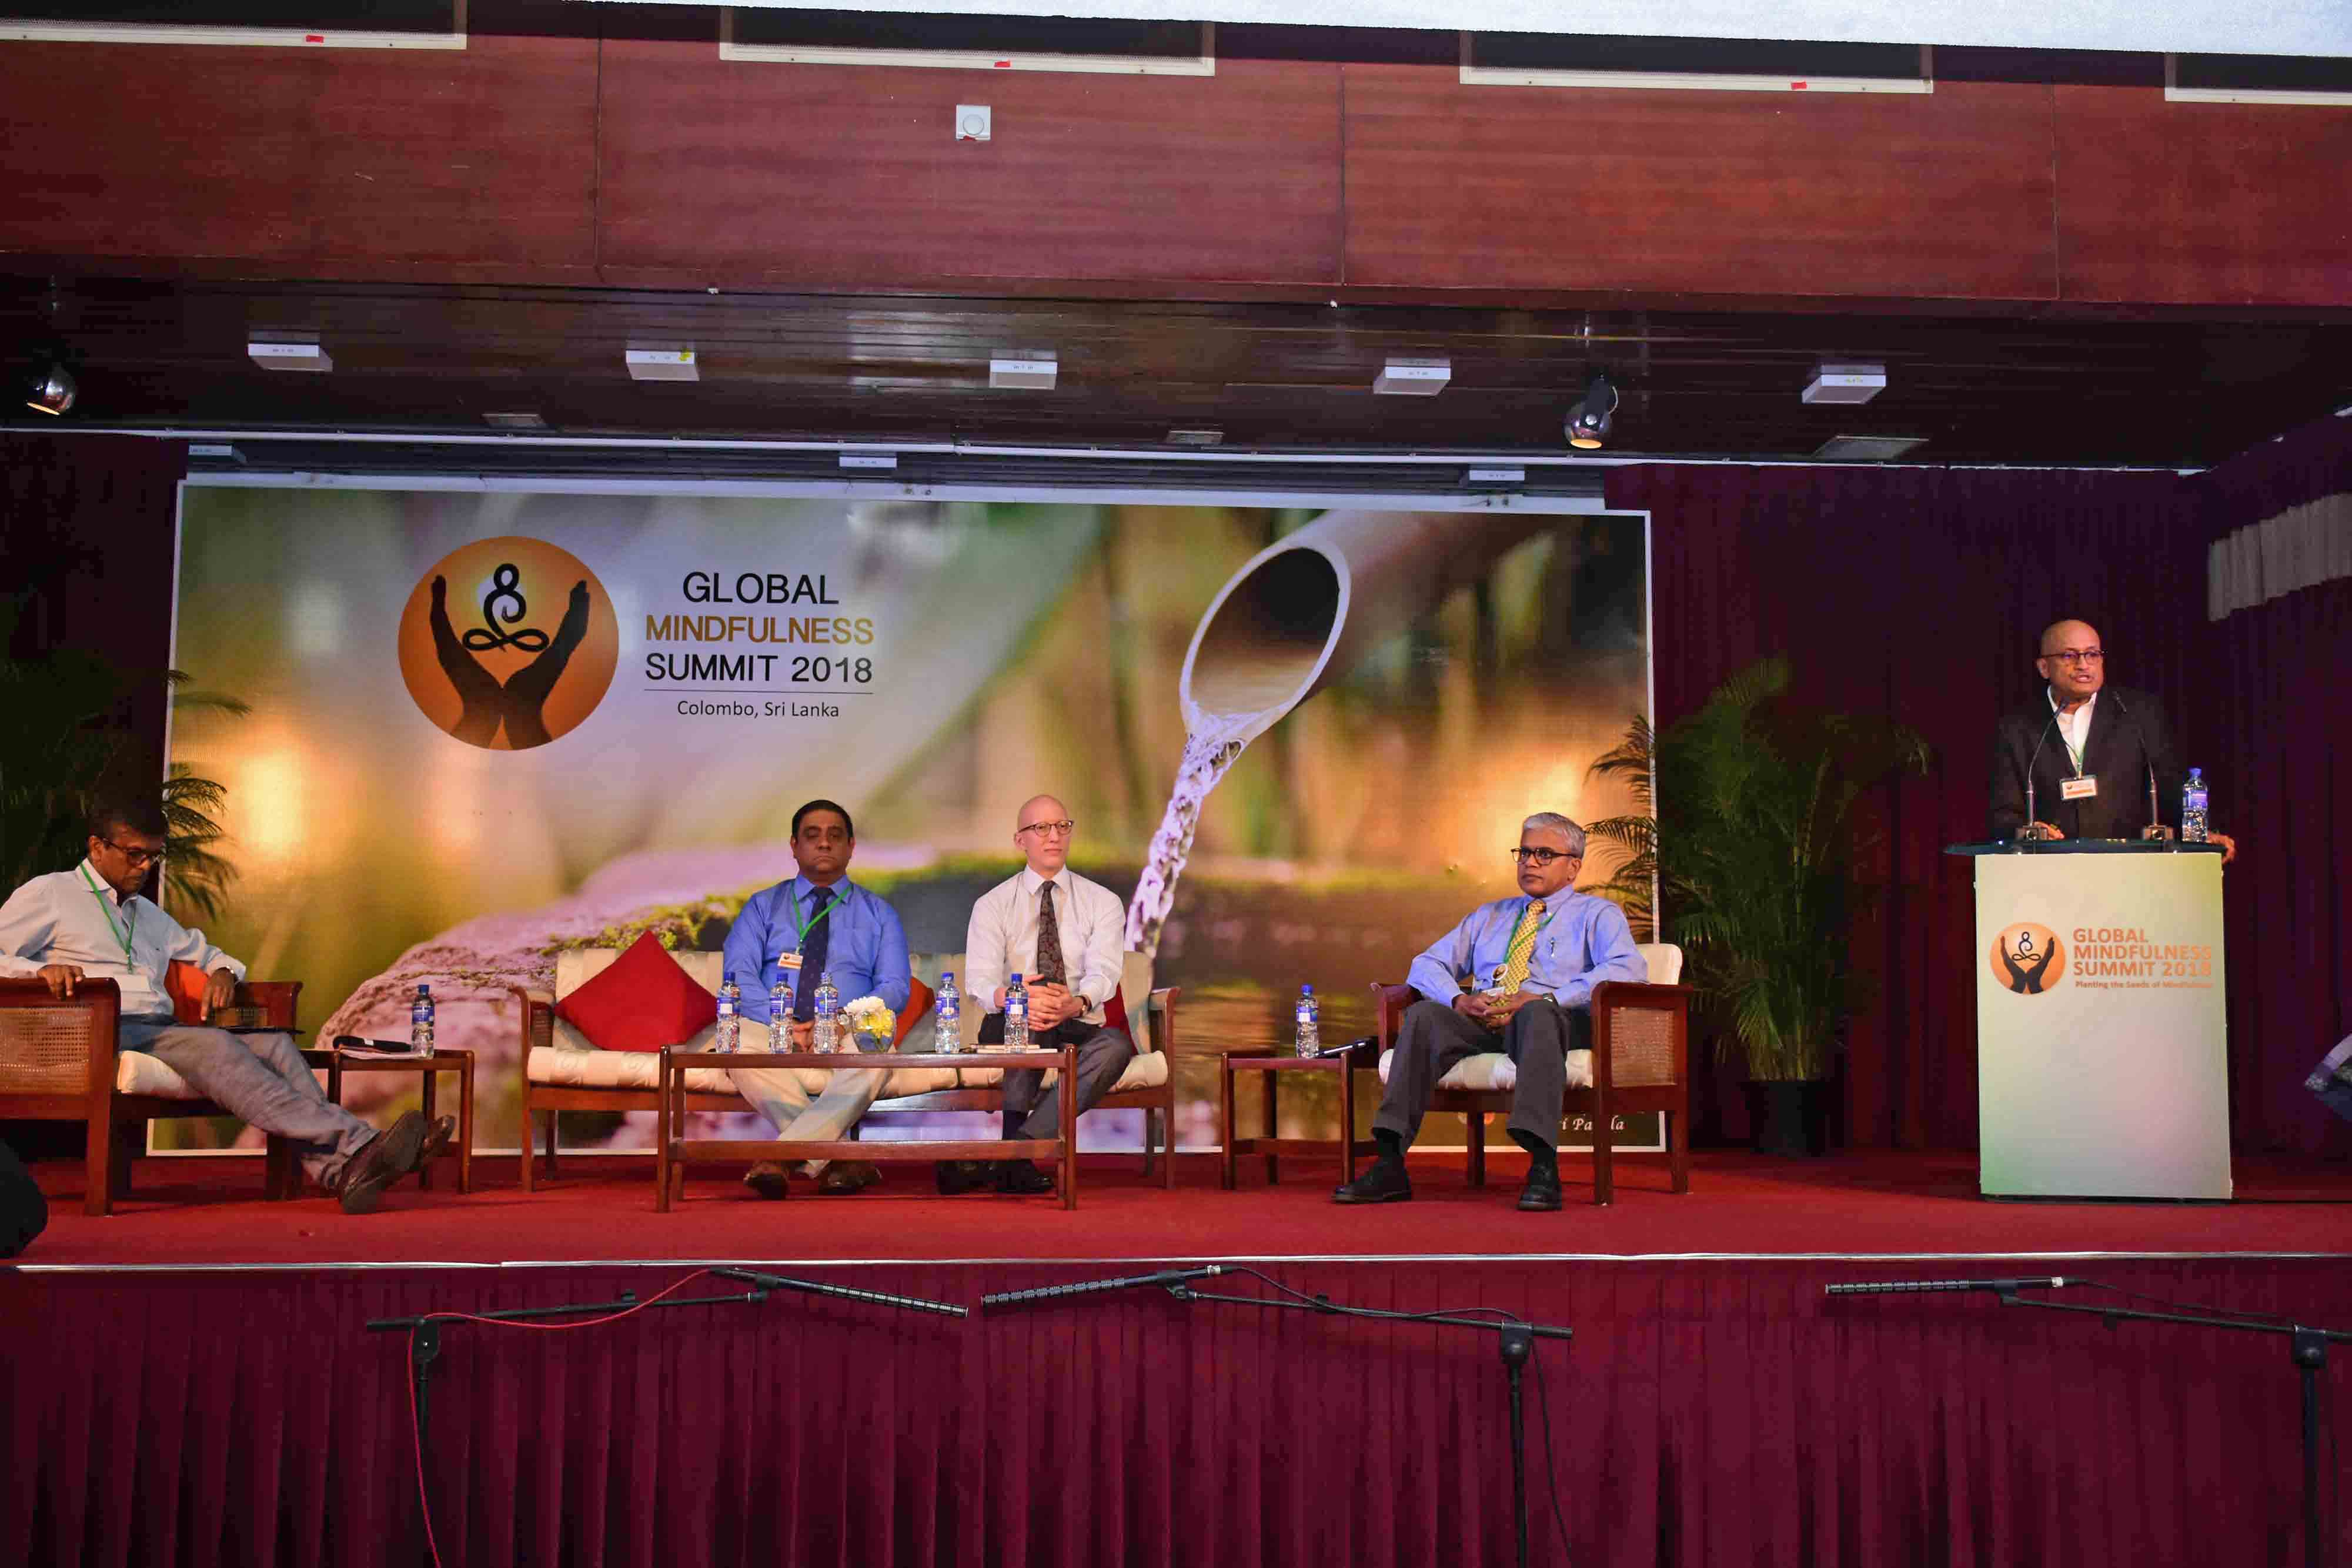 Global Mindfulness Summit 2018 - Day2 (25)